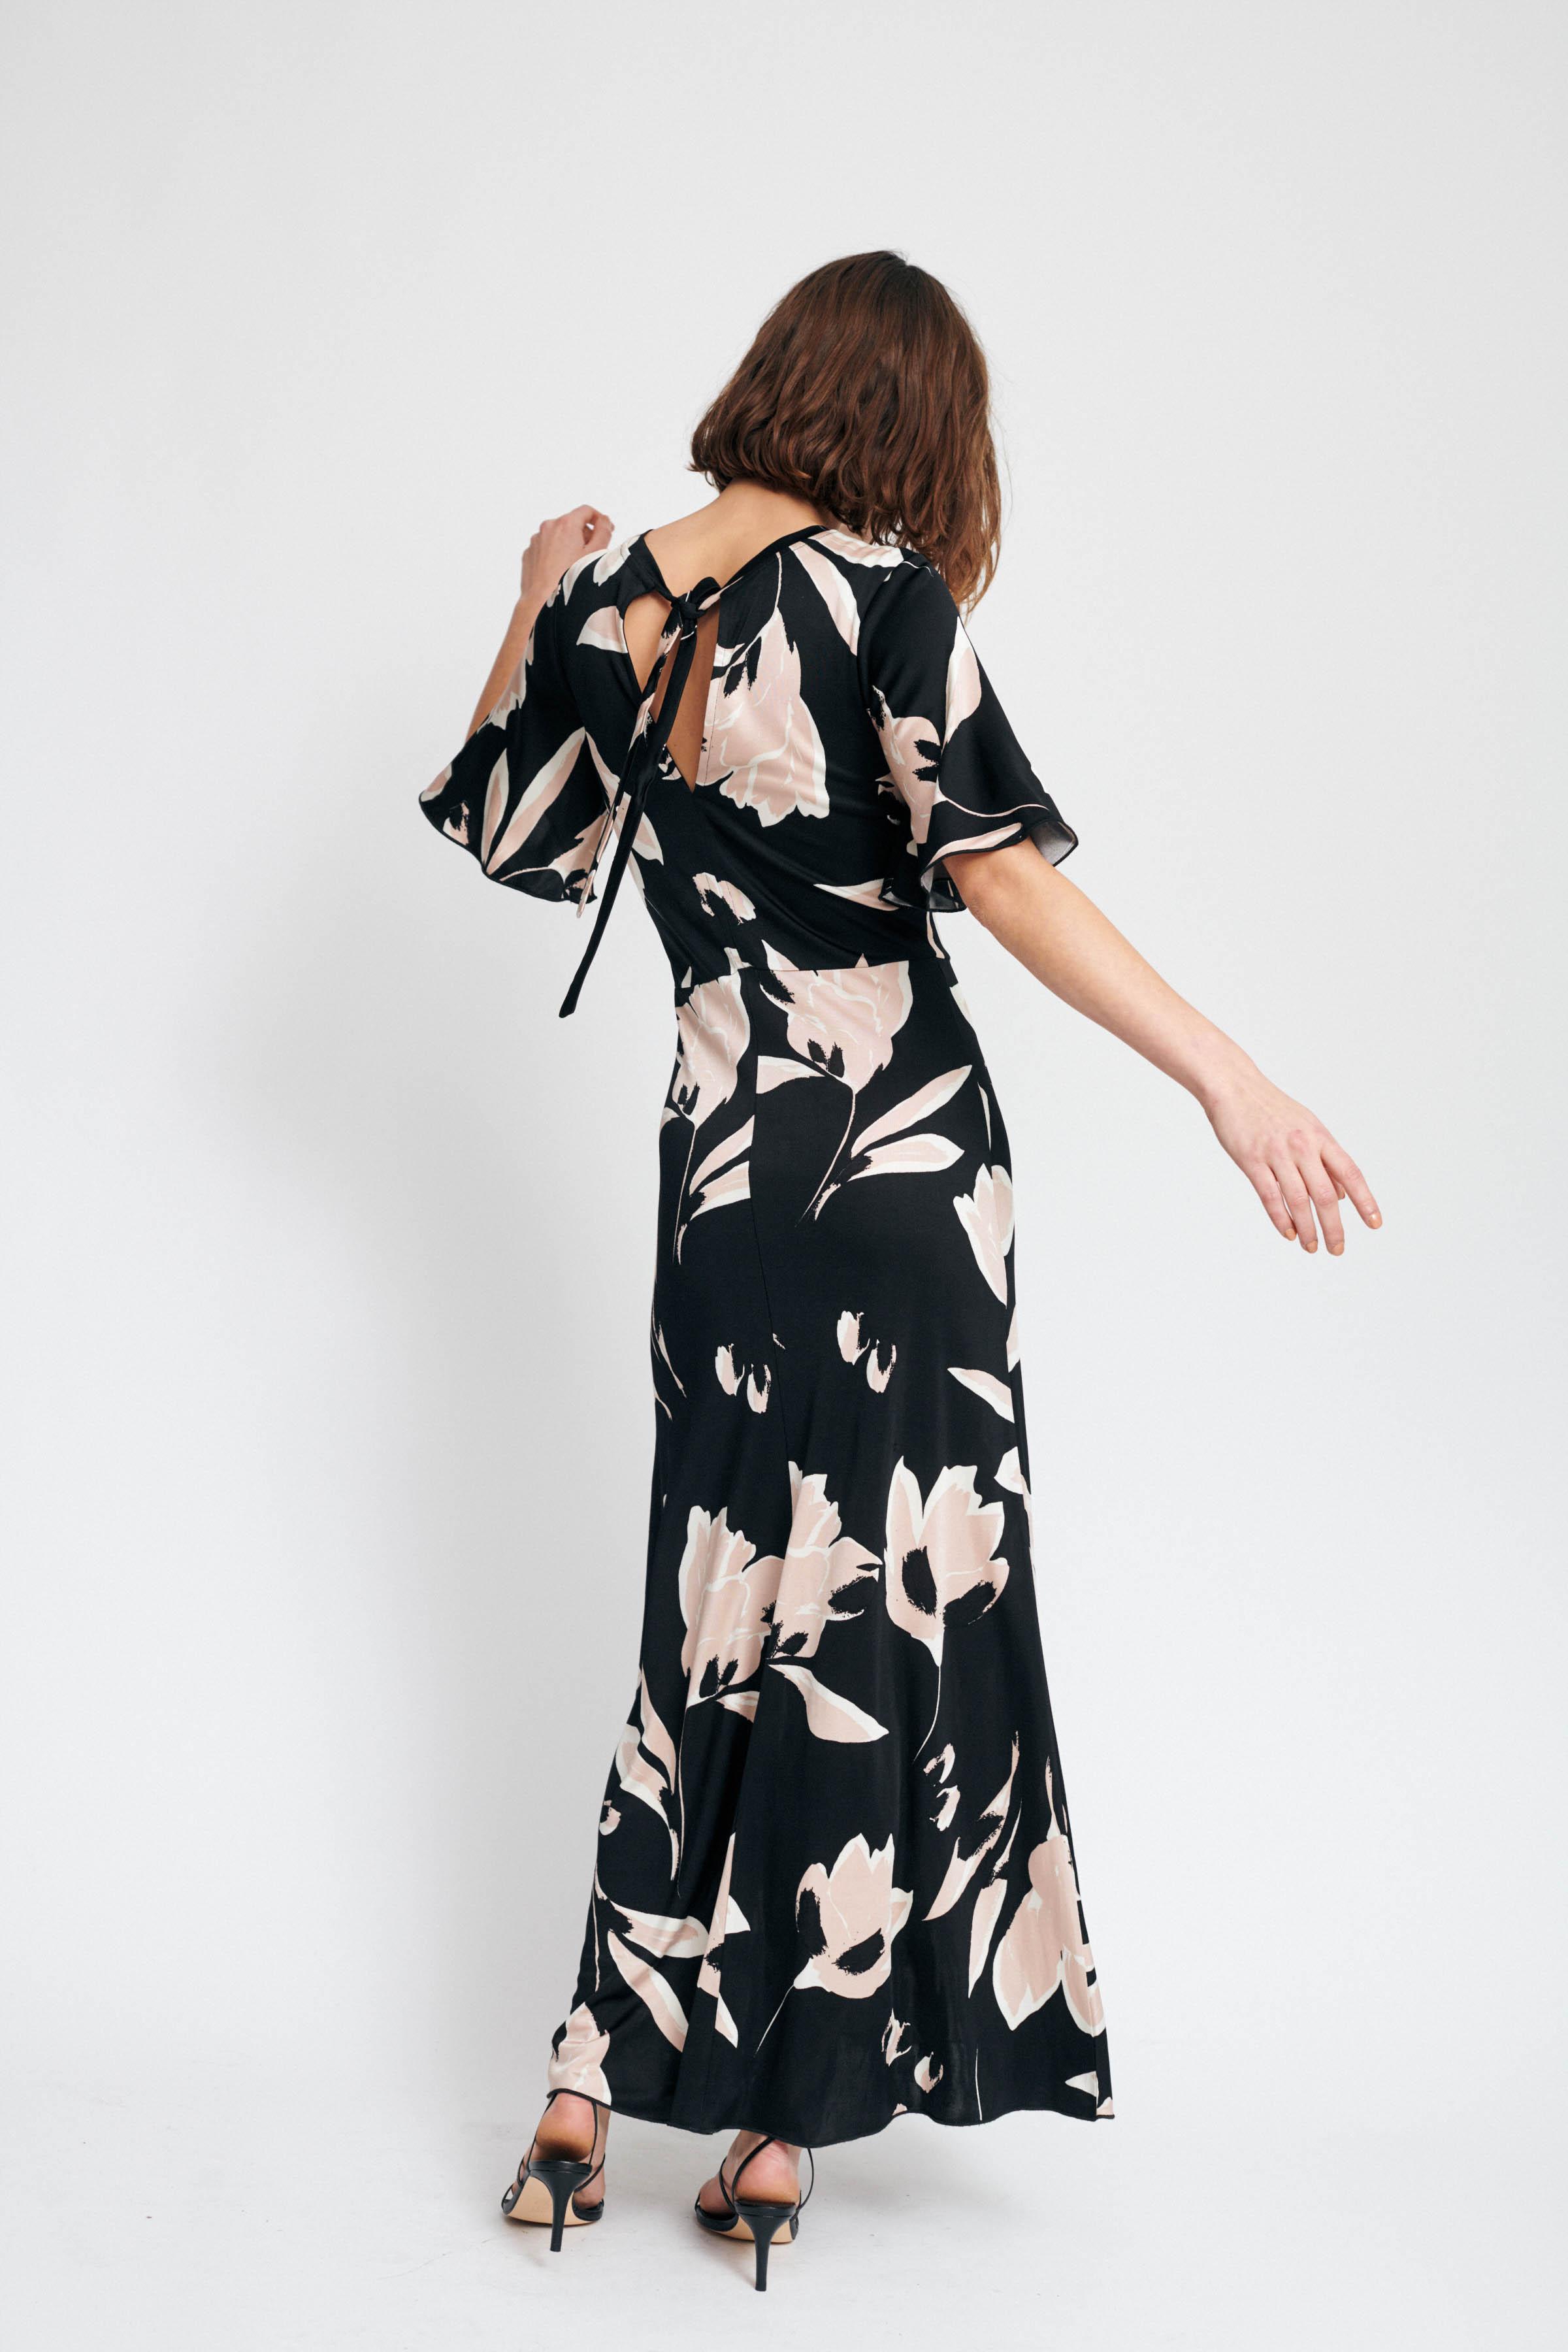 Black Lilly Big Jerseykjole – Køb Black Lilly Big Jerseykjole fra str. XXS-XXL her